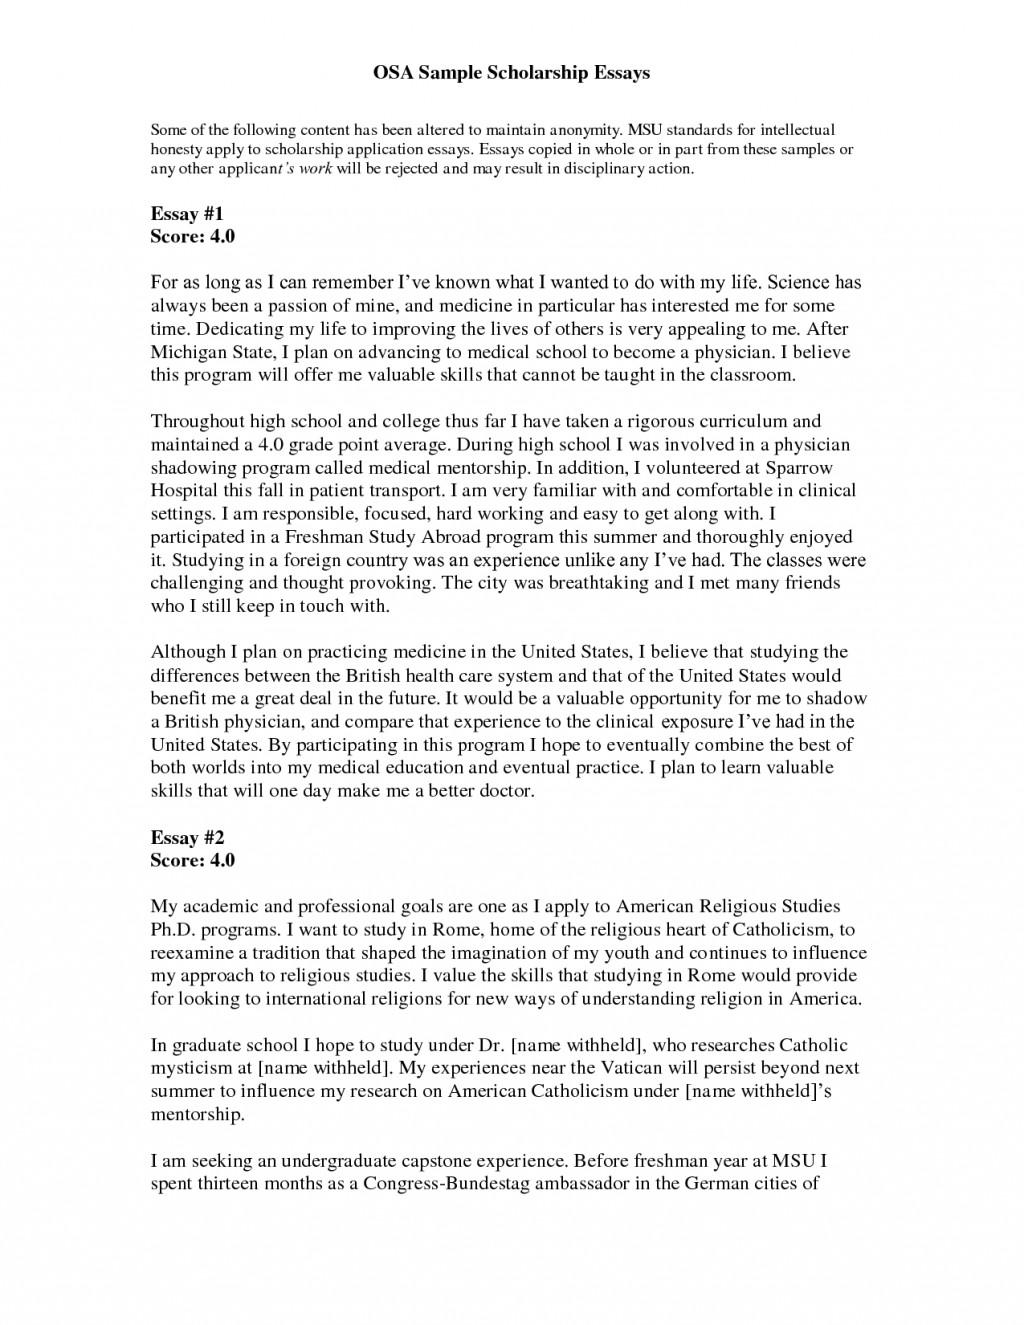 003 Uvs74i83av Scholarships Essay Singular Centralis Scholarship Topics Chevening Tips About Yourself Large